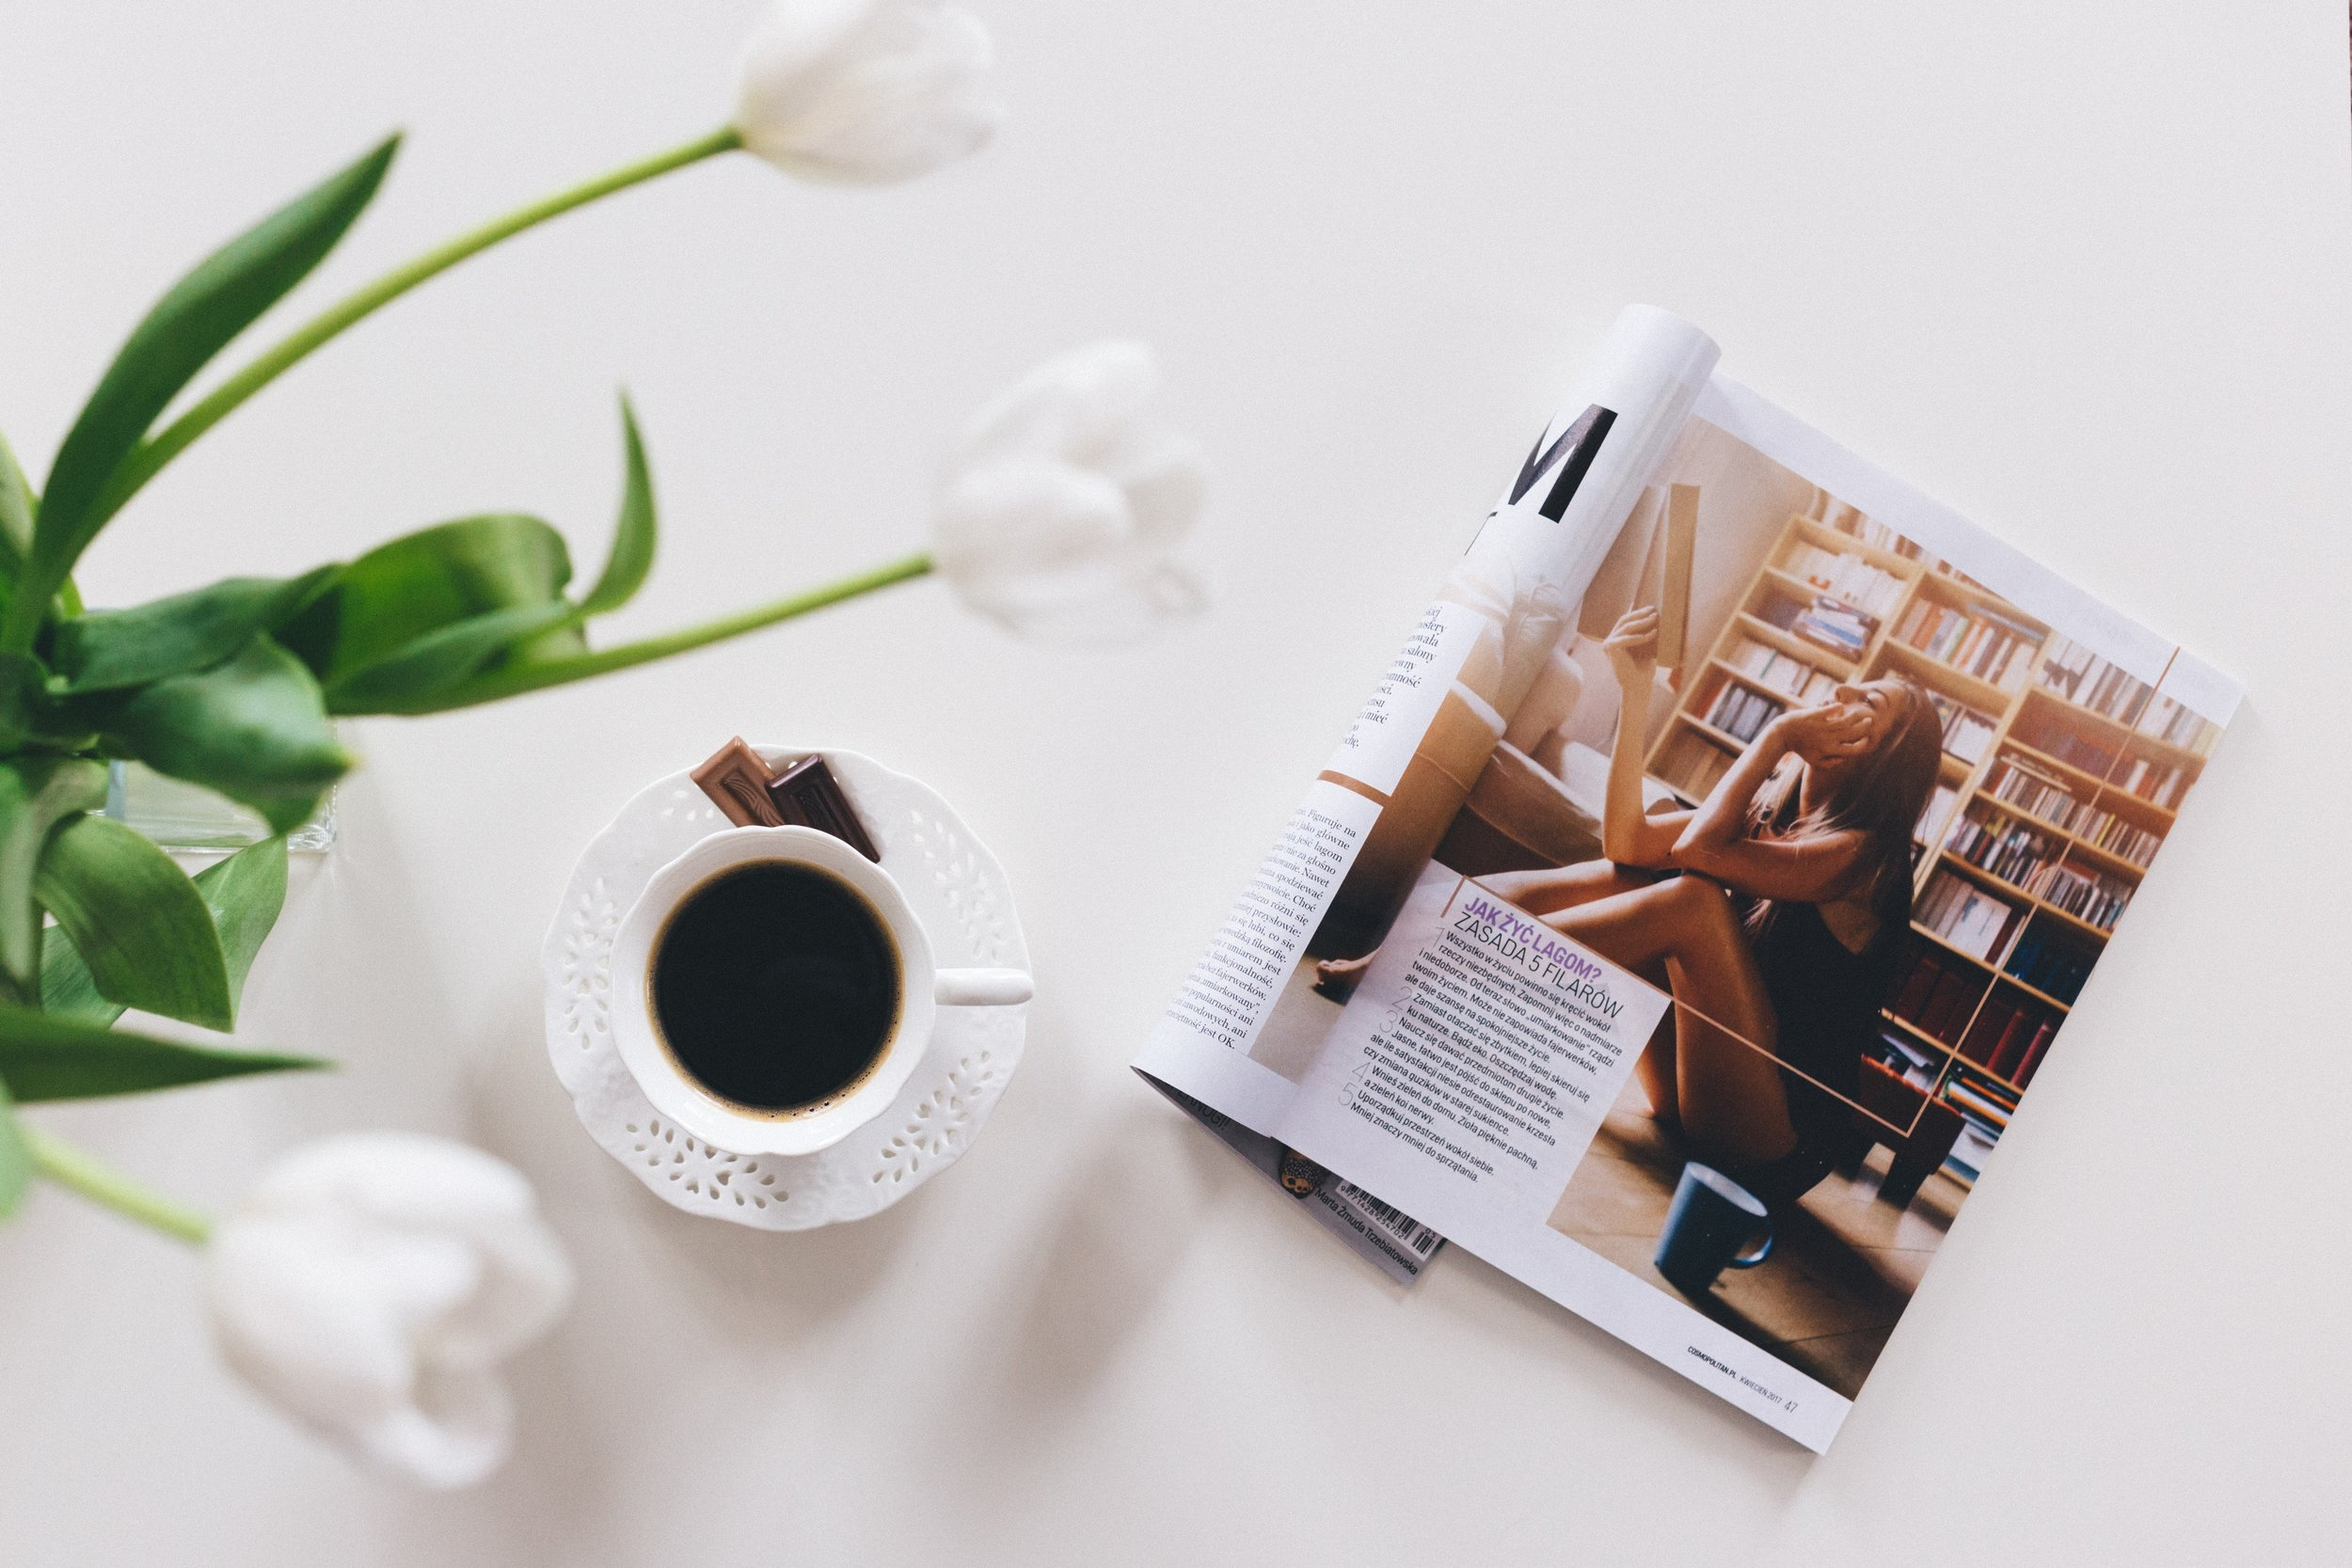 black-coffee-blur-cup-and-saucer-818650.jpg